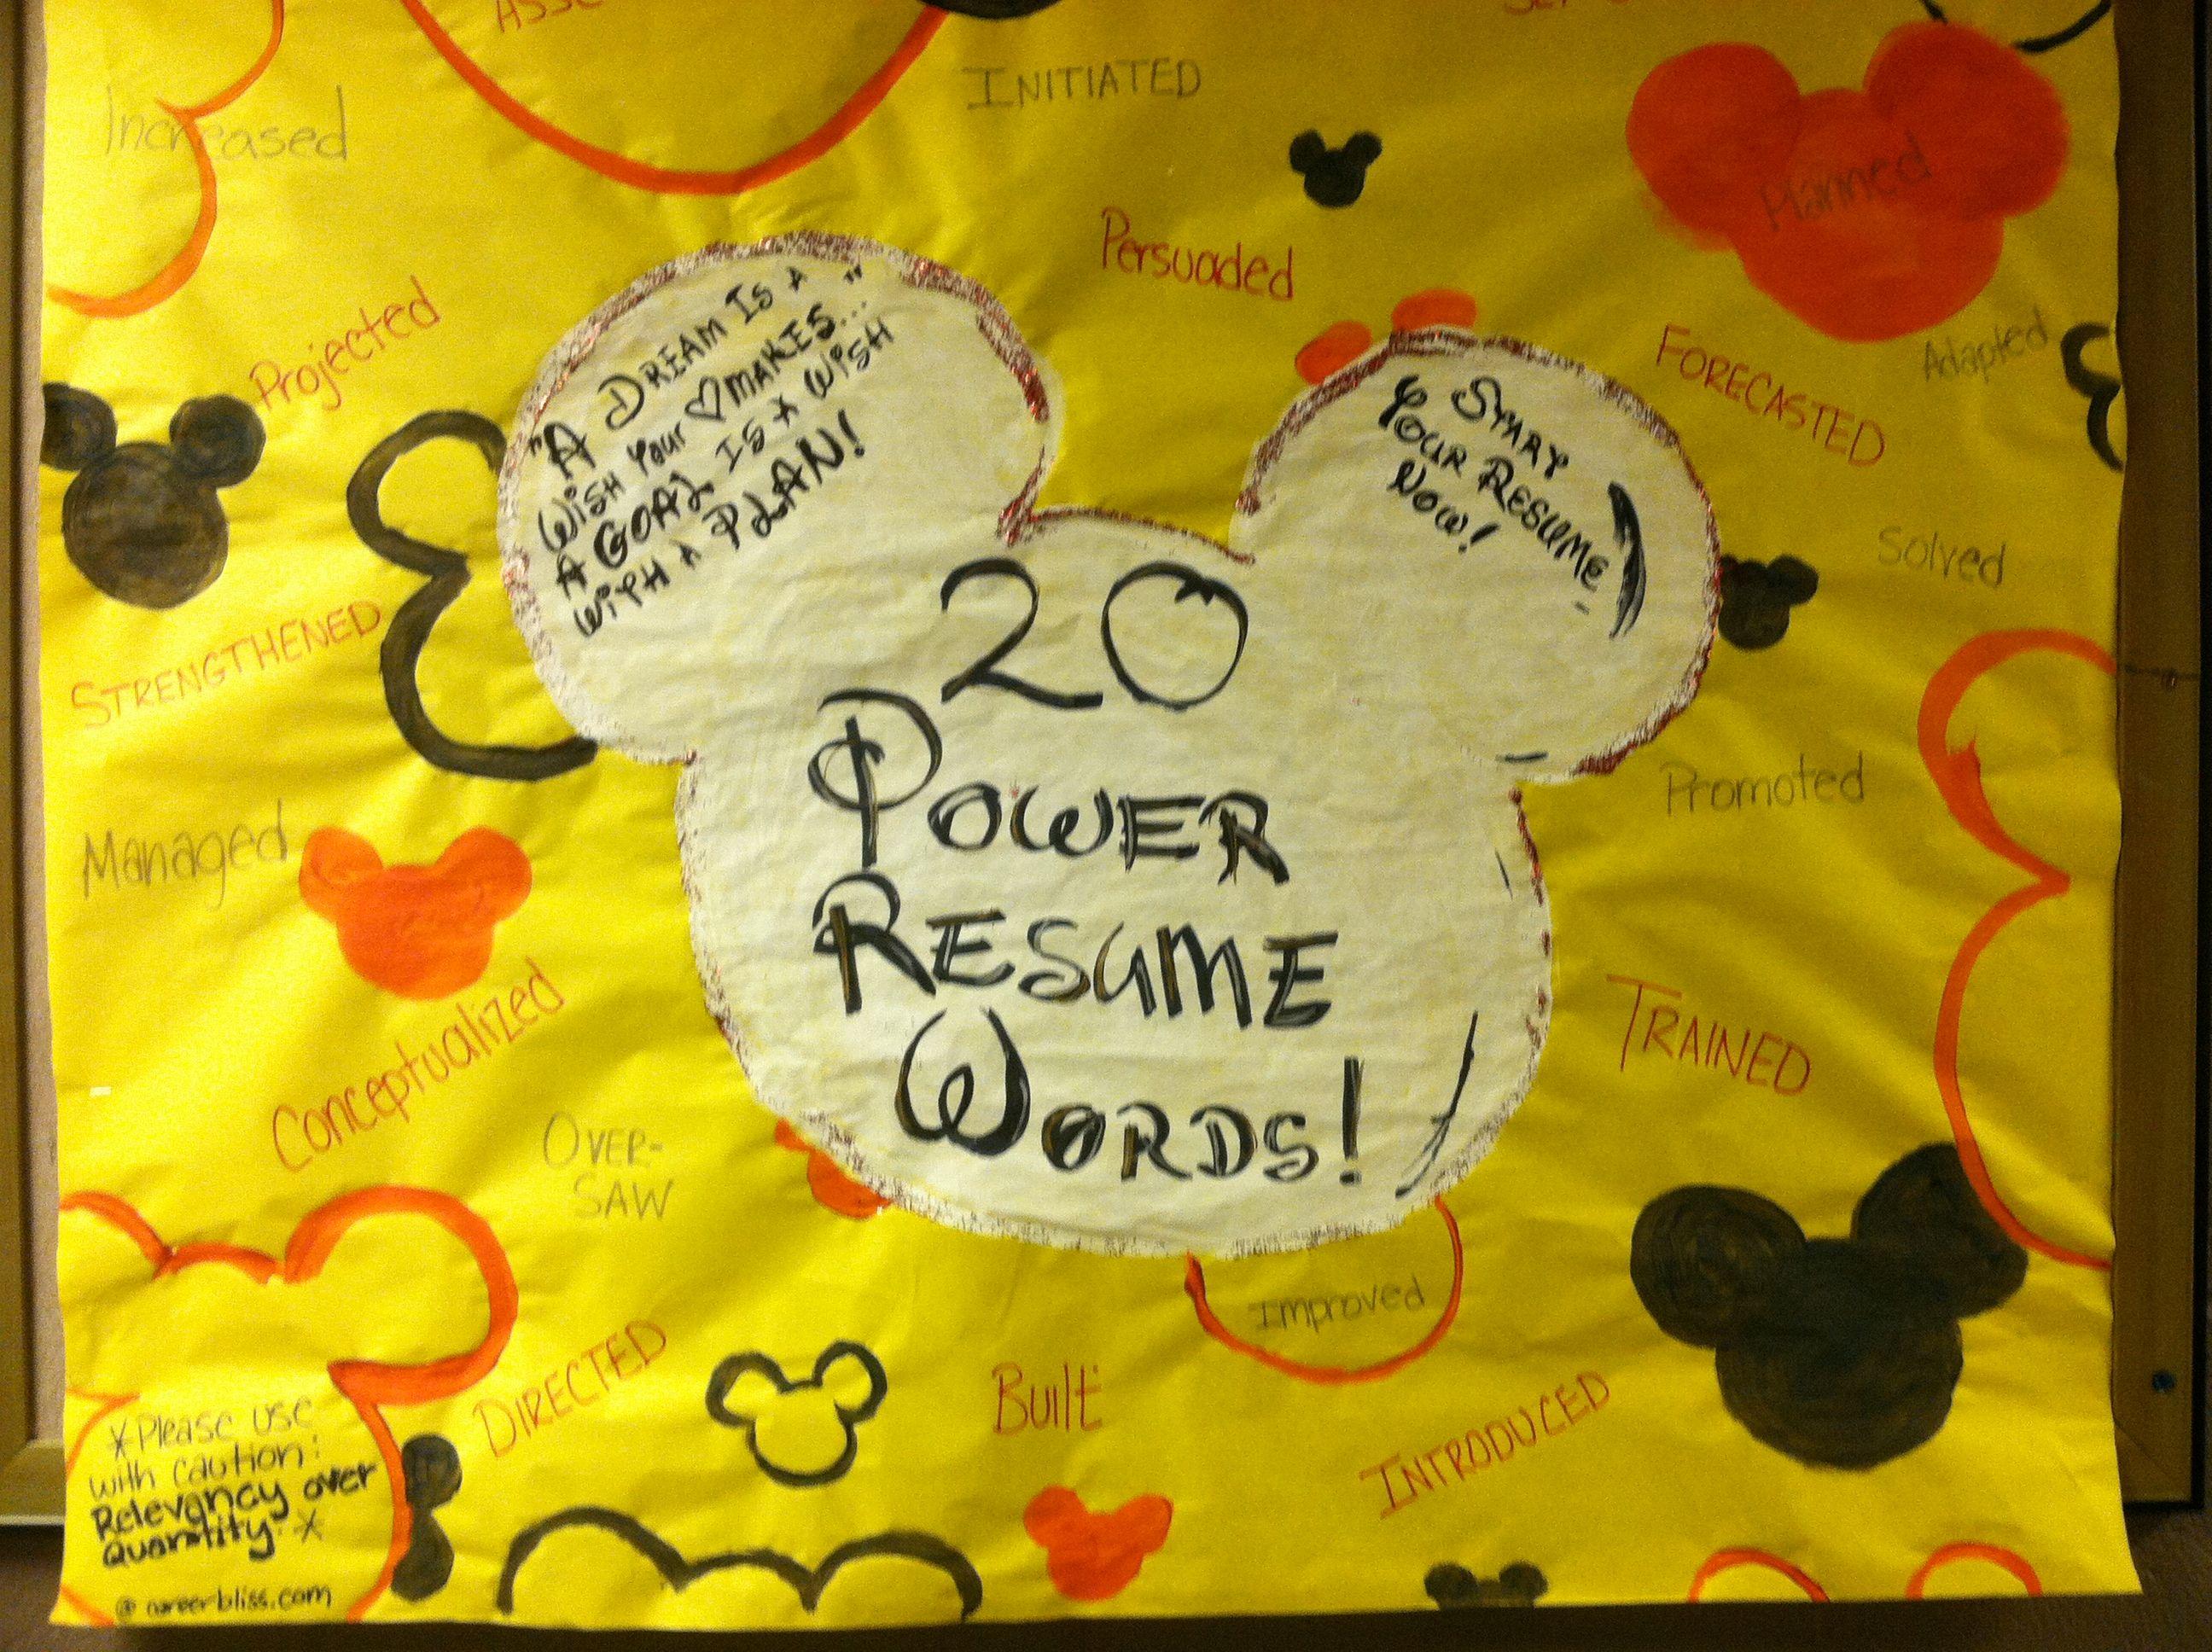 20 power resume words Disney themed bulletin board! | My Life as a ...